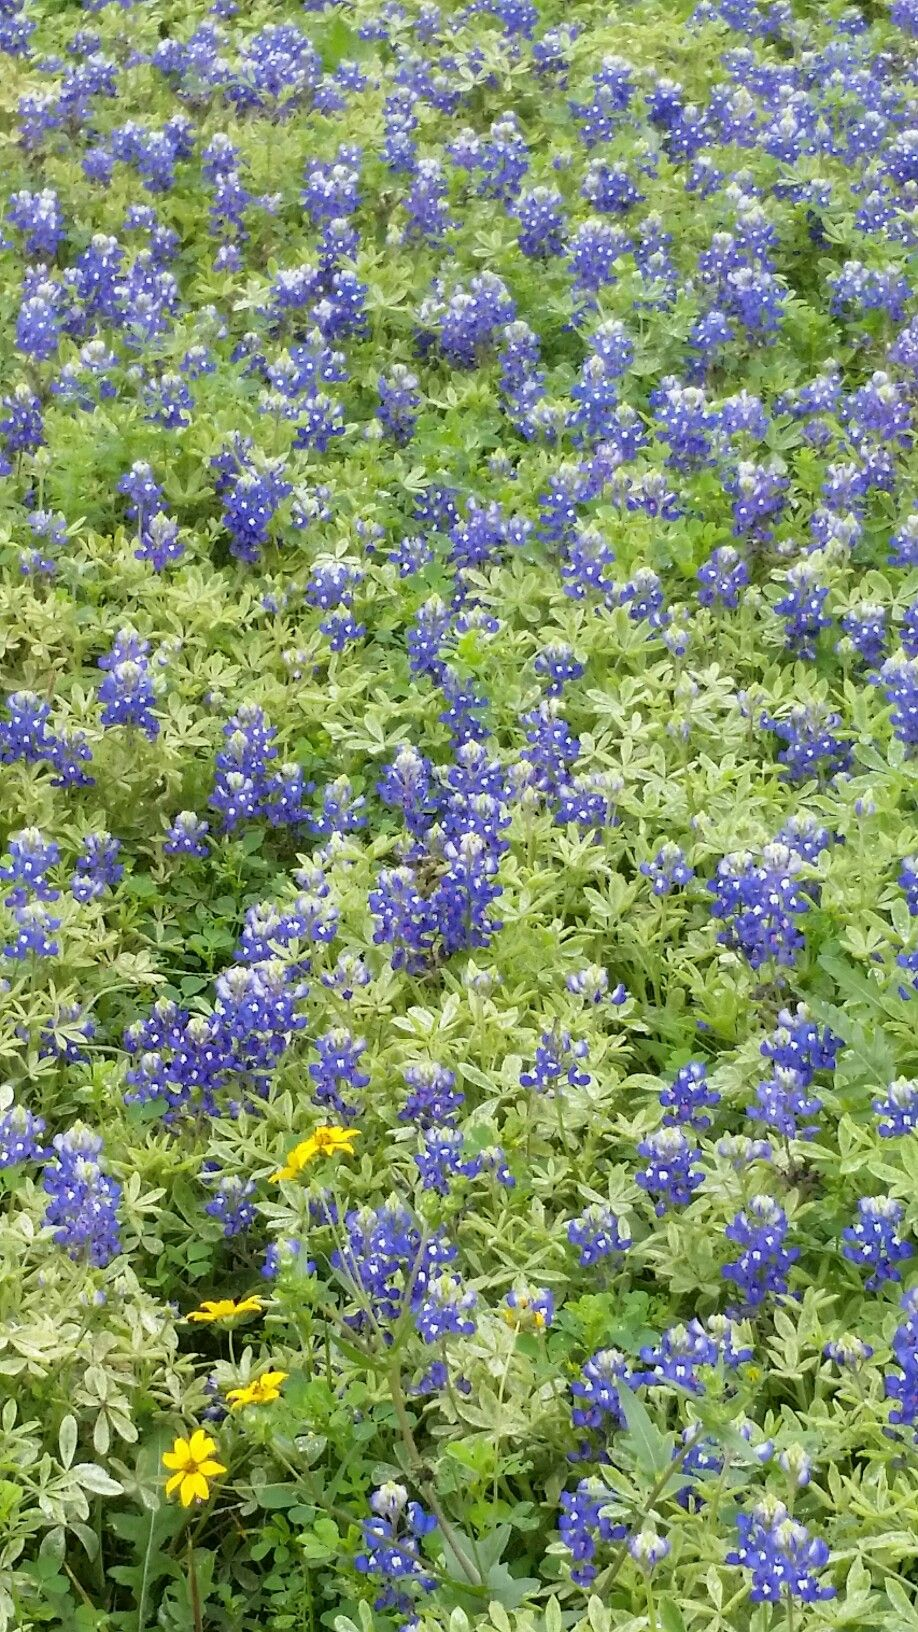 Bluebonnets In Bloom Corpus Christi 3 2019 Corpus Christi Texas Corpus Christi Texas Gardening